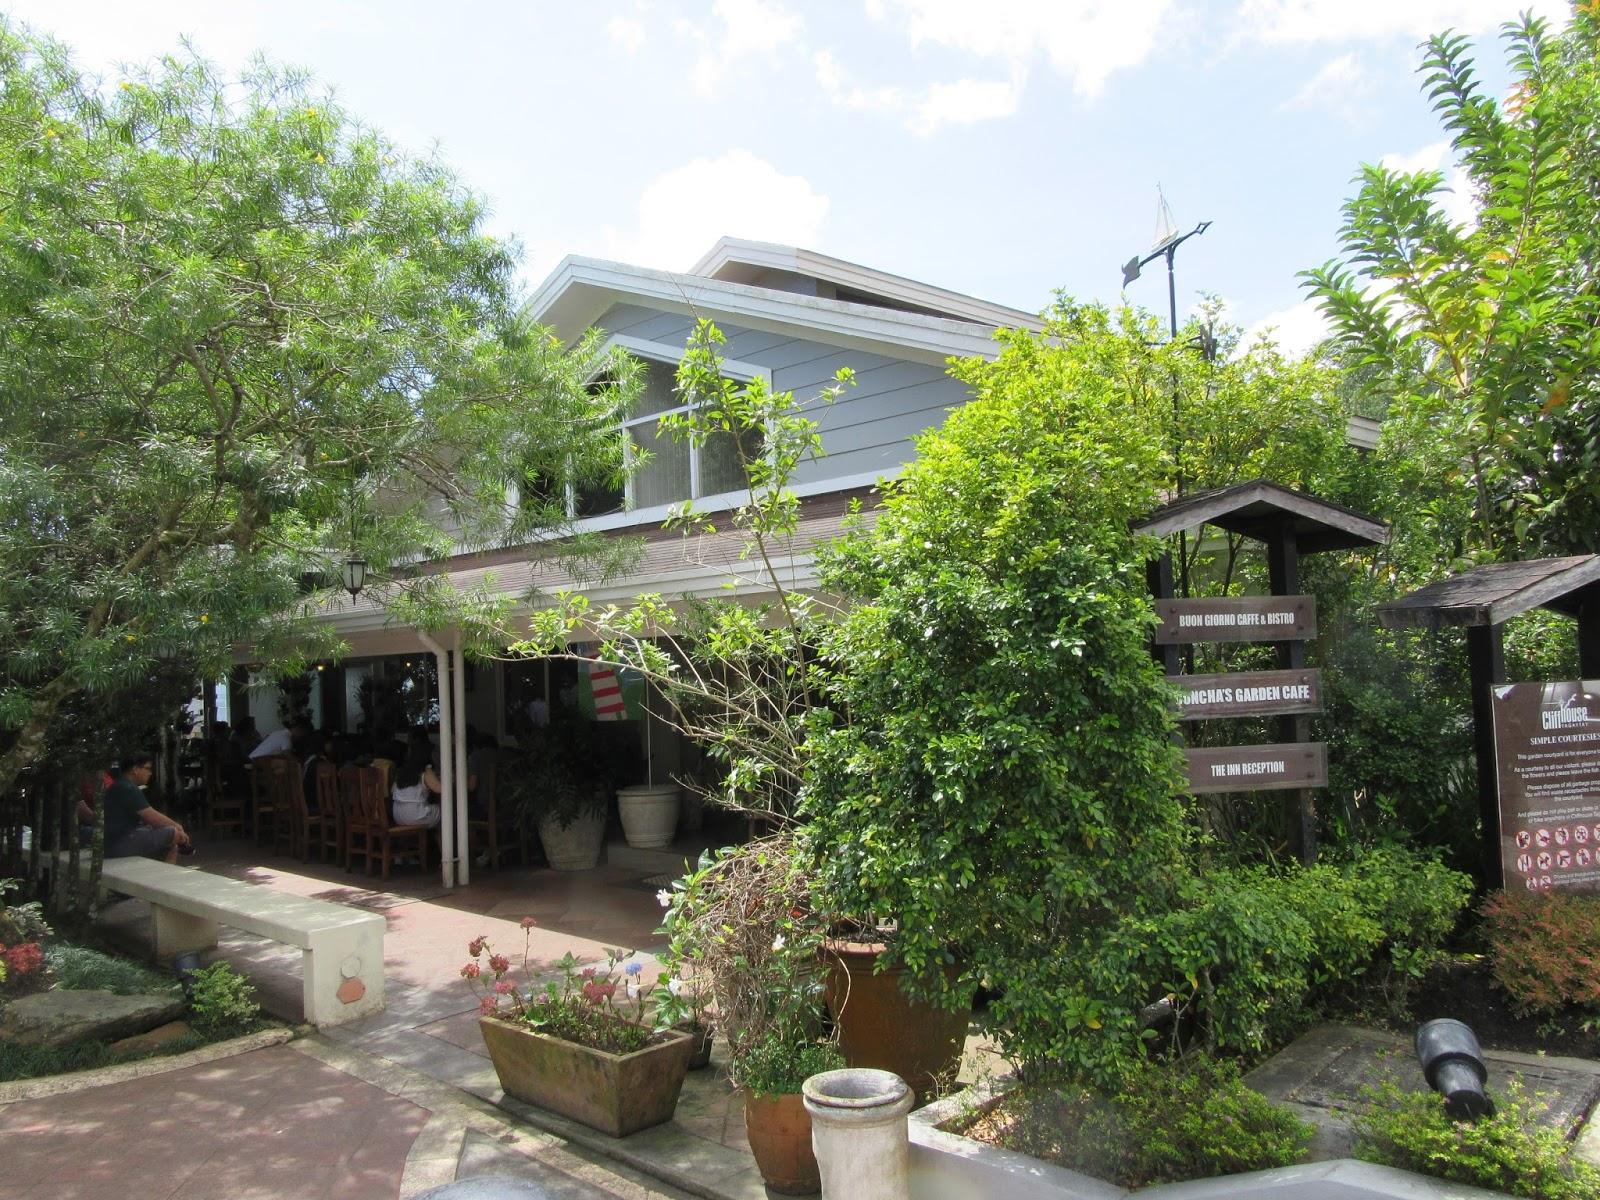 Norwegian Epic Garden Cafe Menu